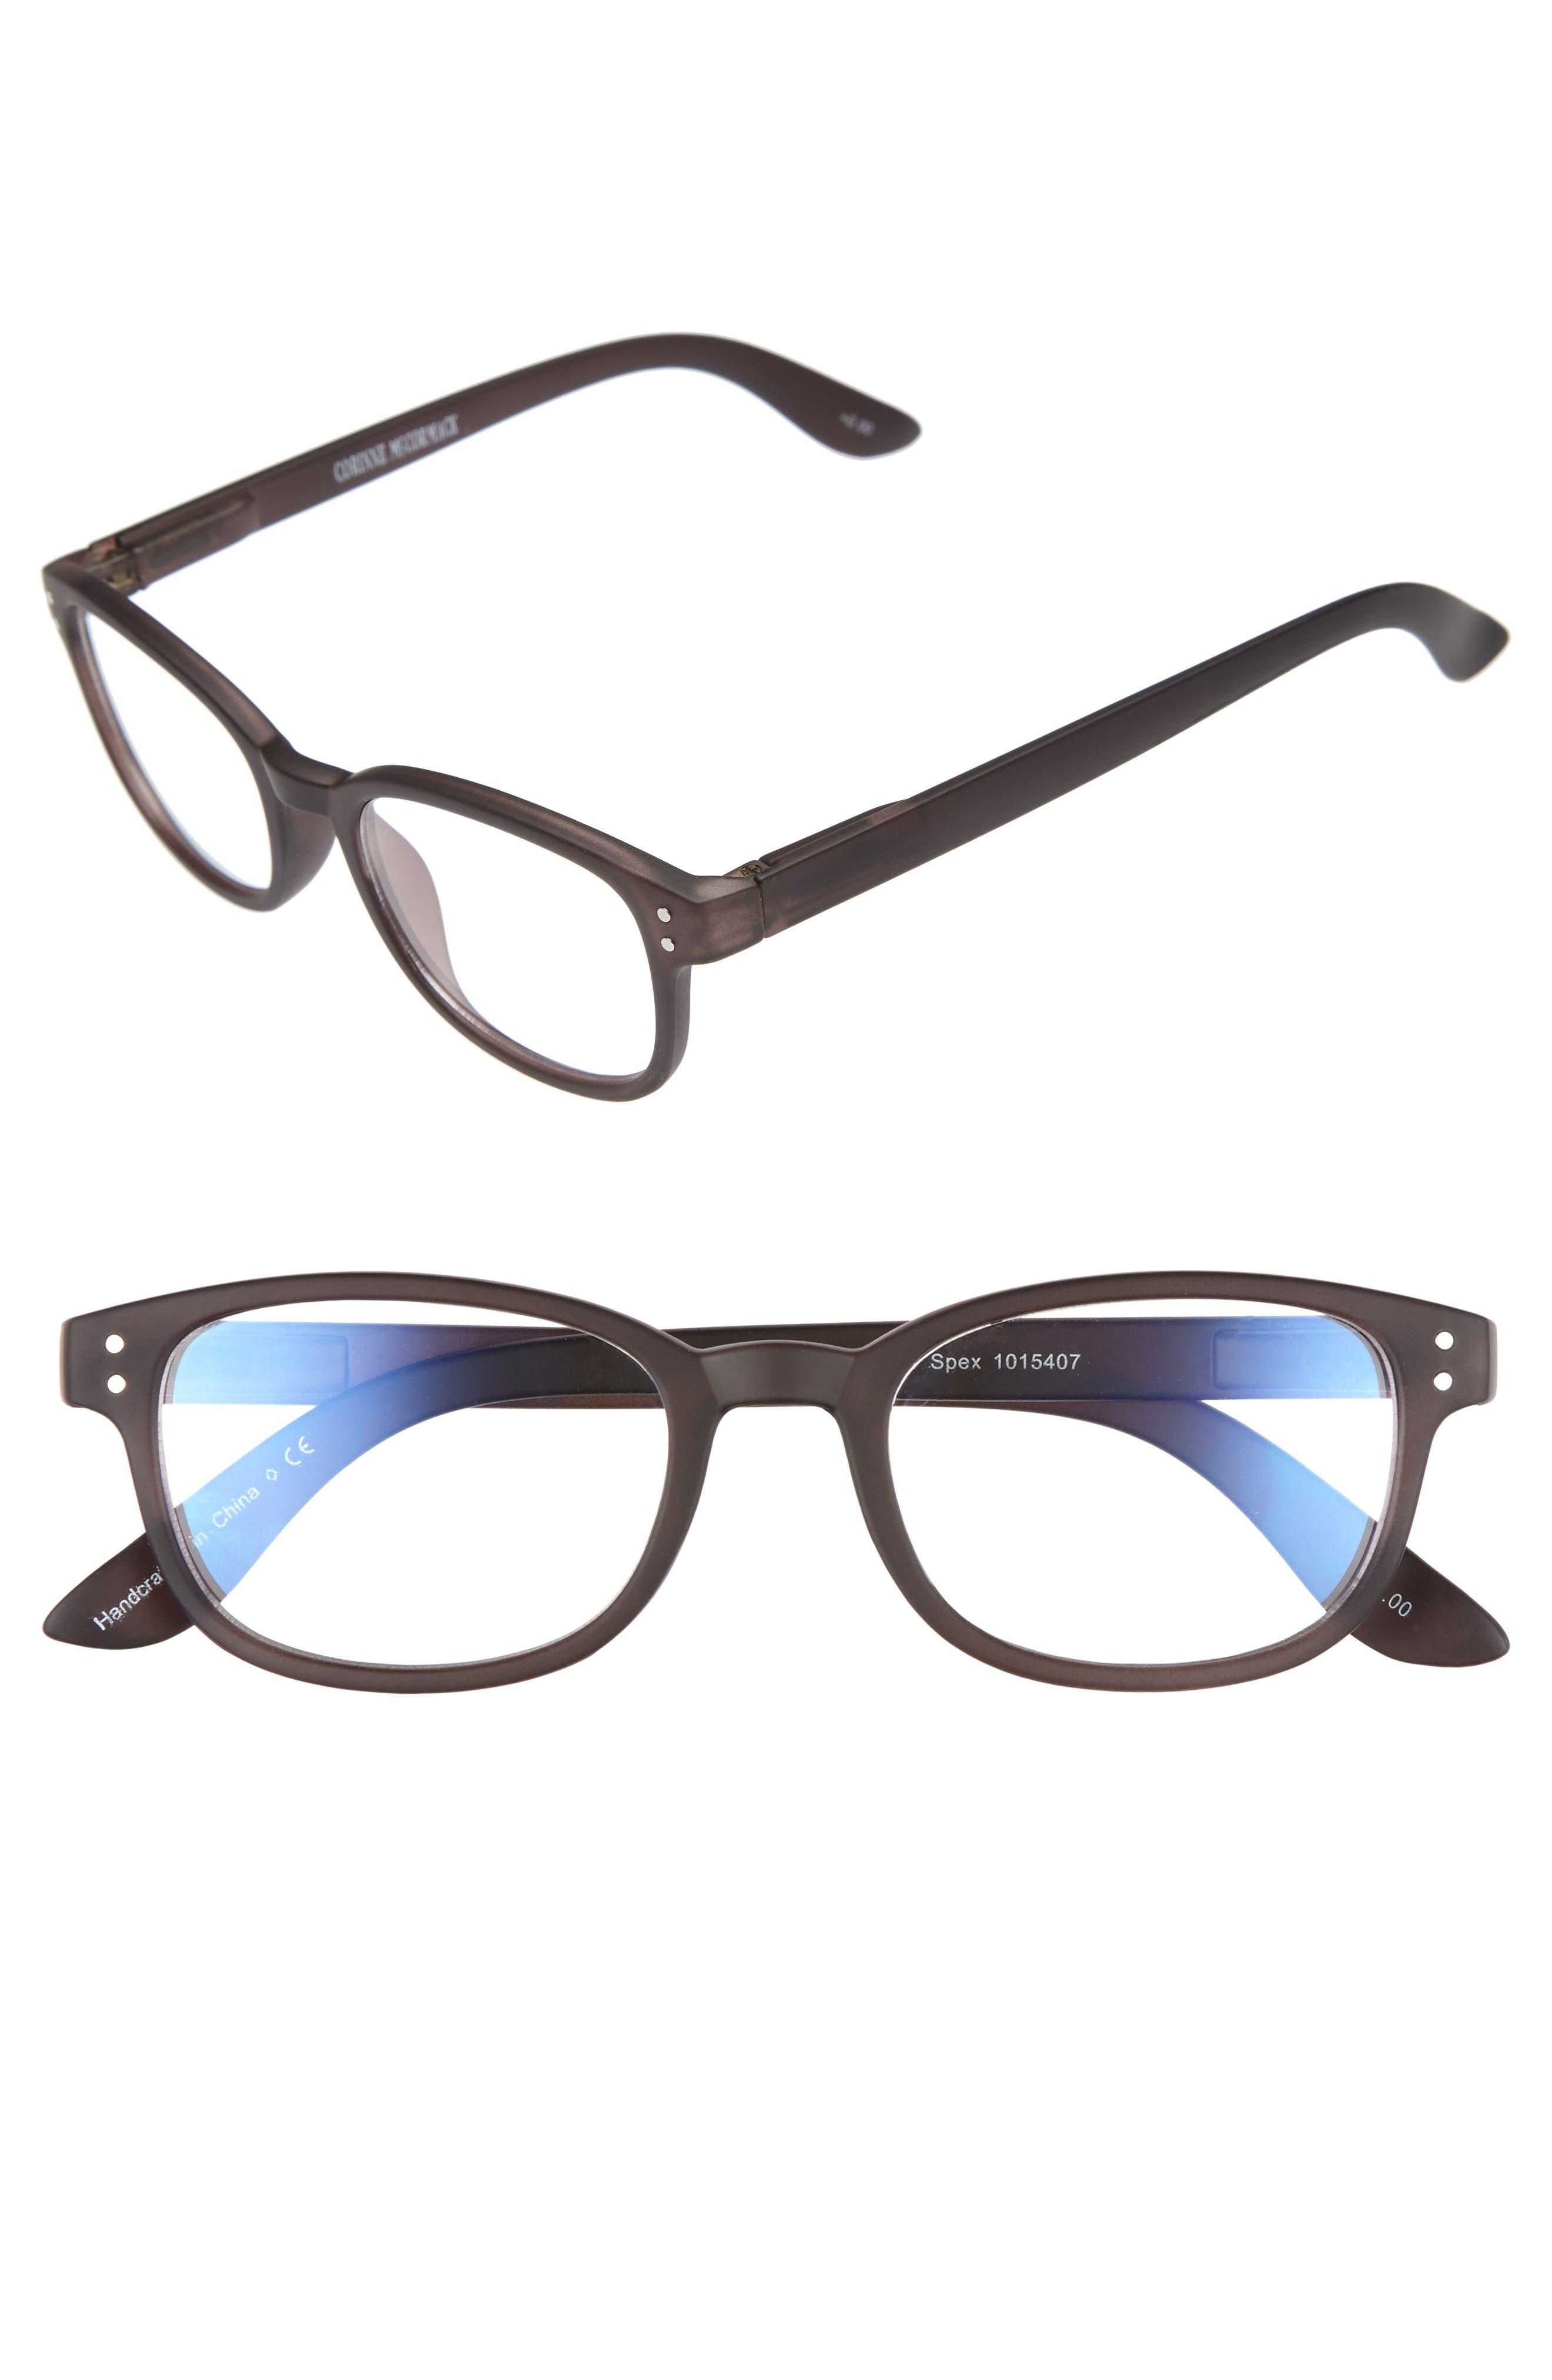 ColorSpex<sup>®</sup> 50mm Blue Light Blocking Reading Glasses,                         Main,                         color, Black